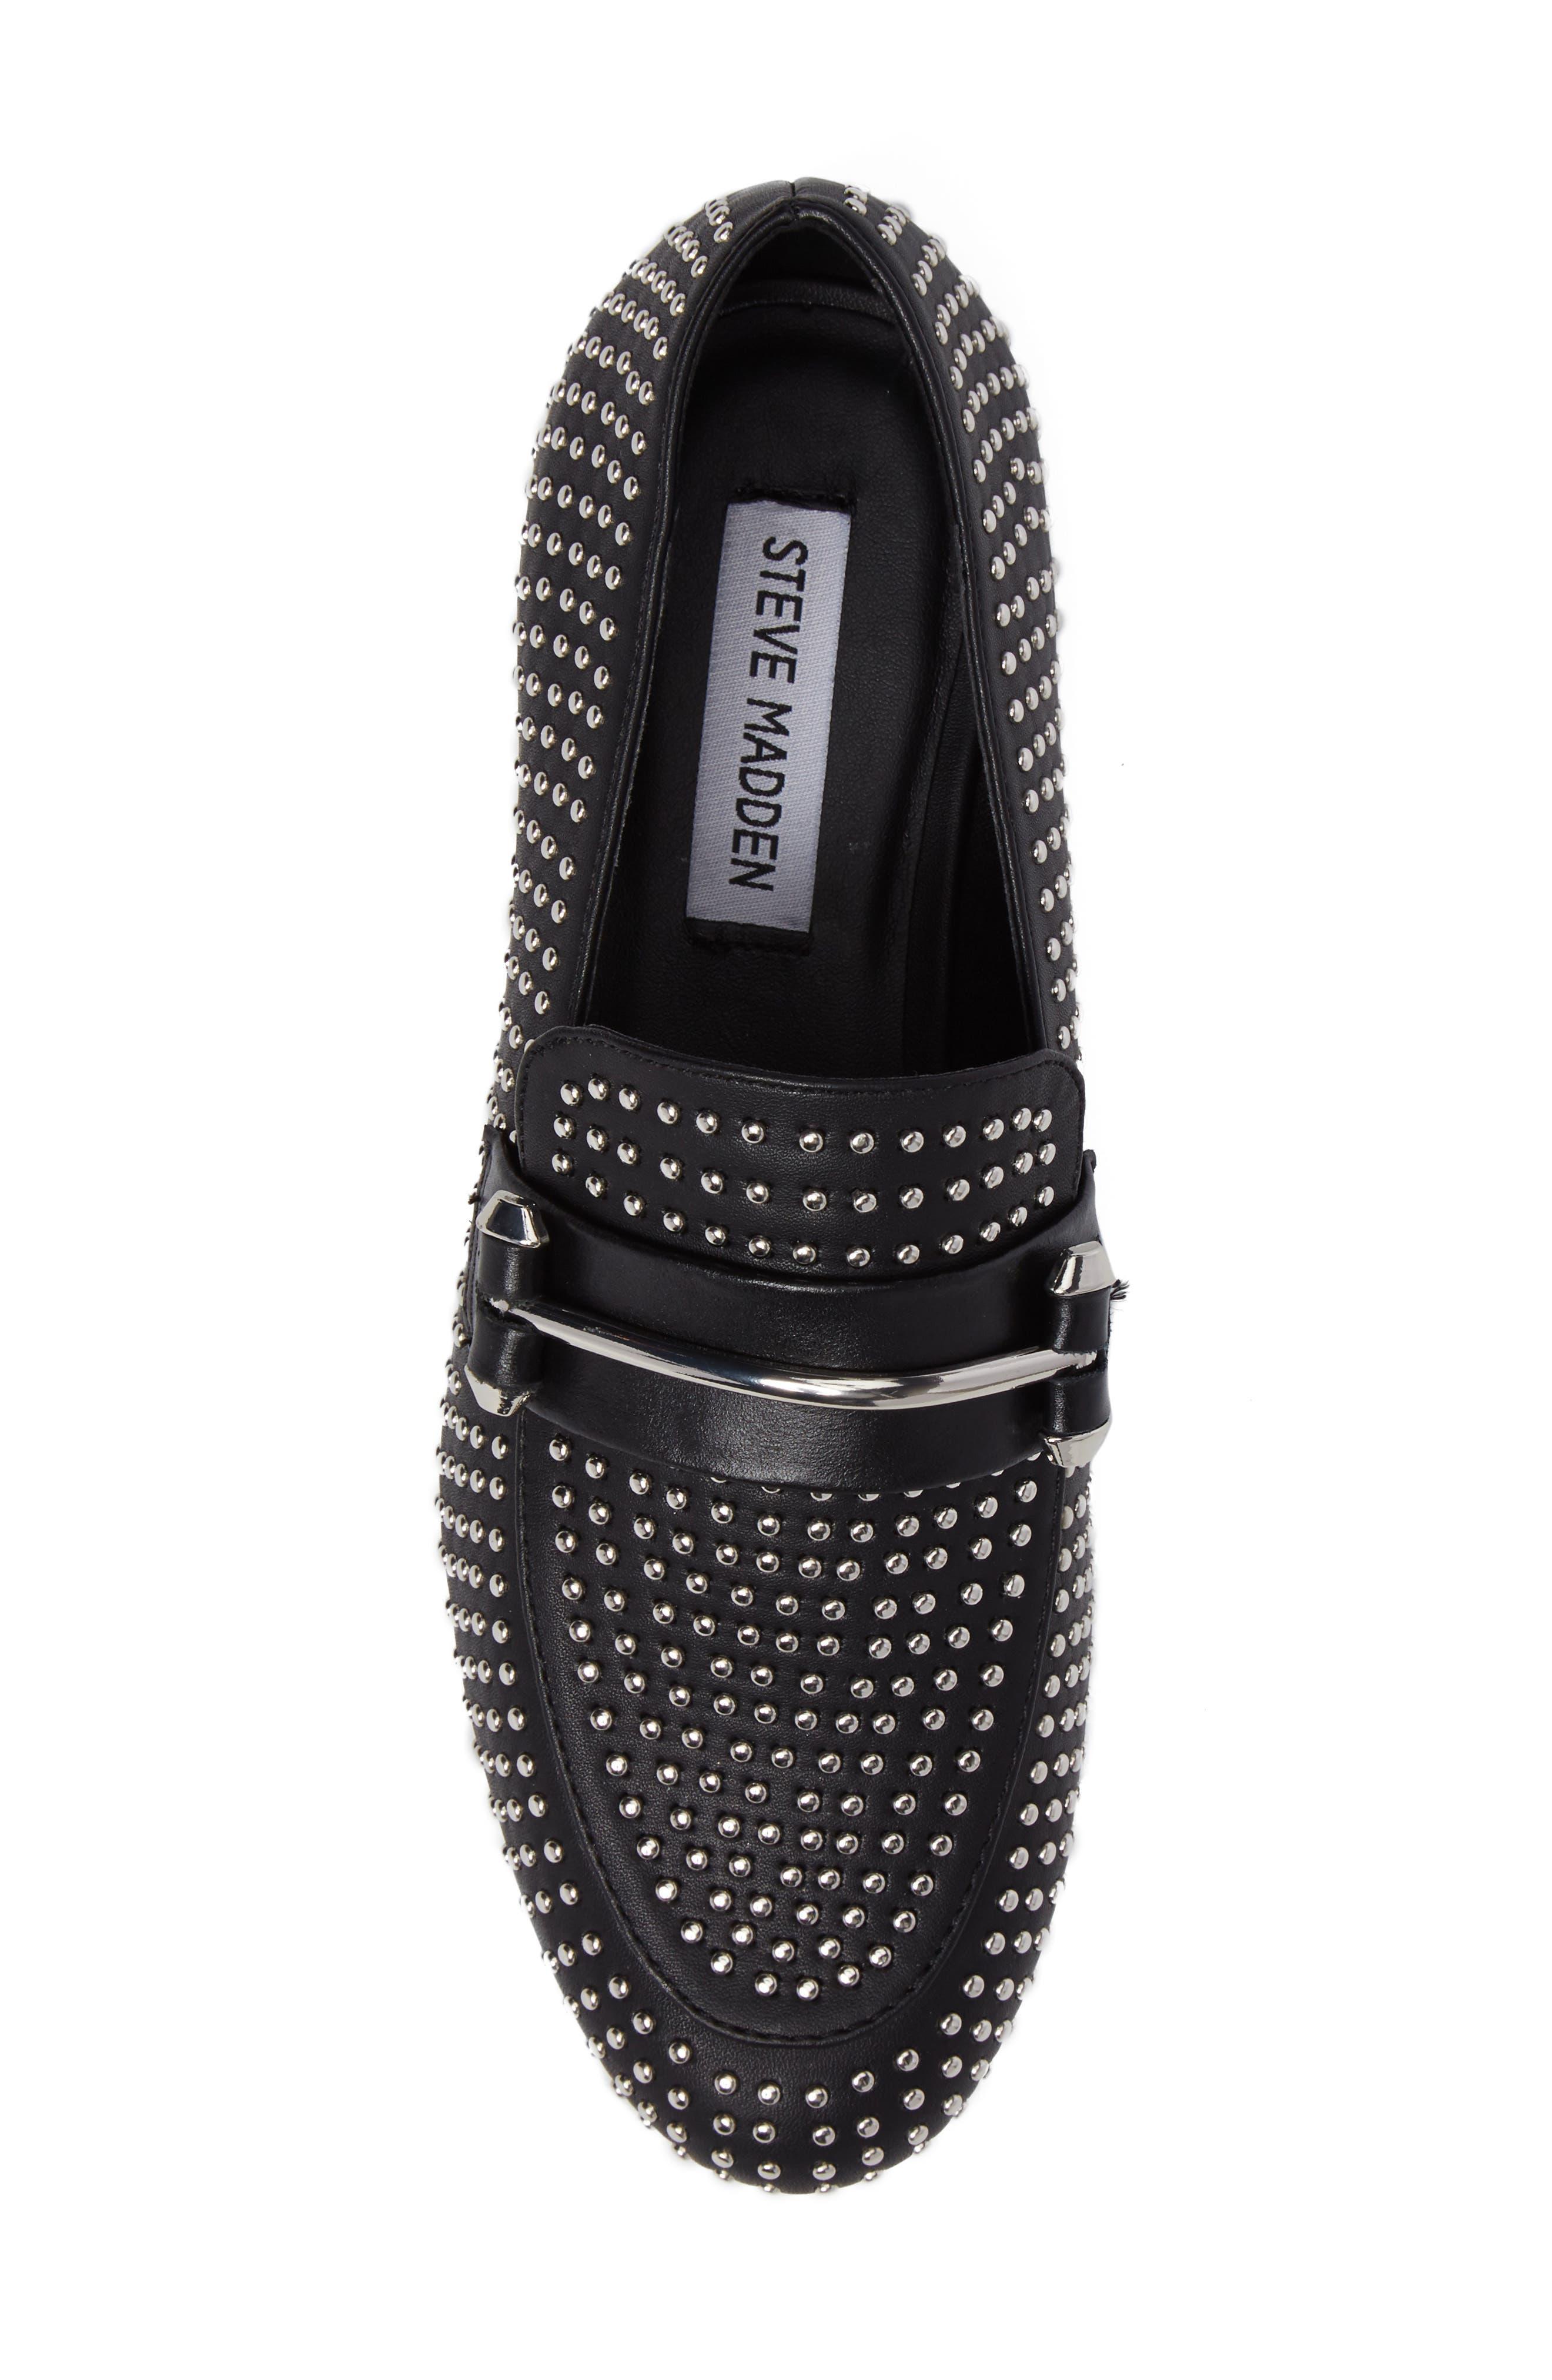 Kast Studded Loafer,                             Alternate thumbnail 5, color,                             Black Faux Leather